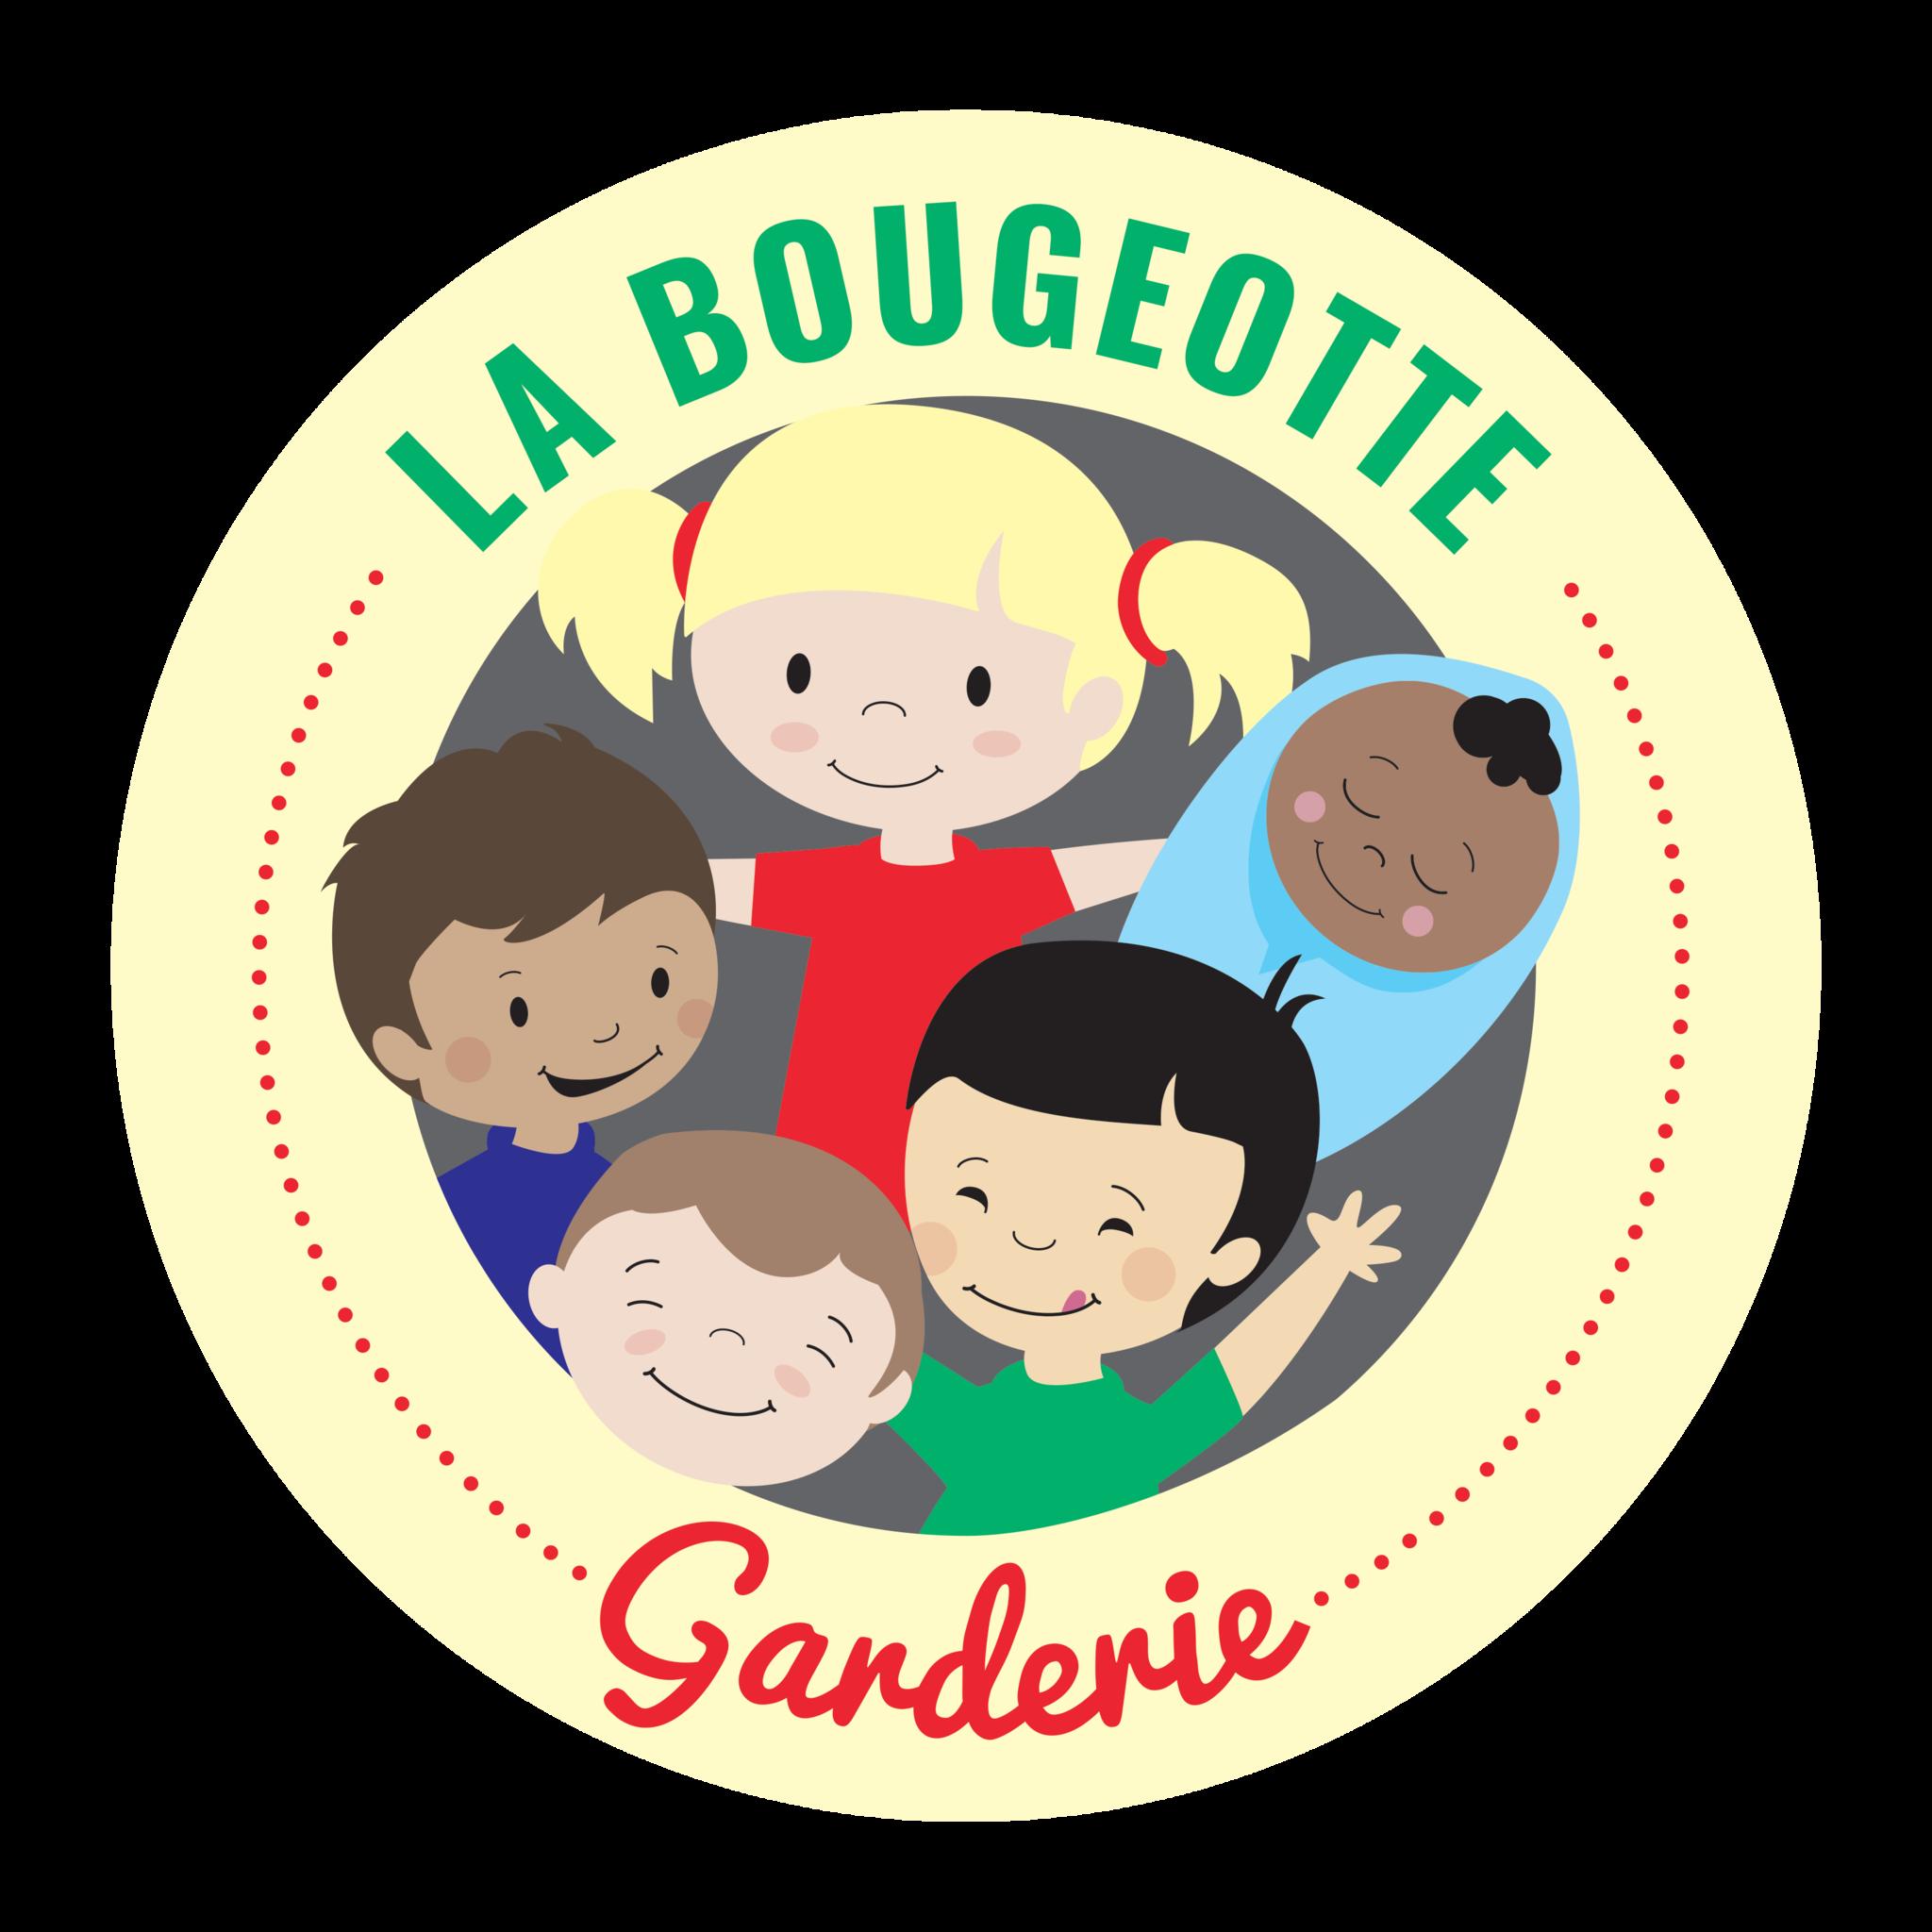 Garderie La Bougeotte